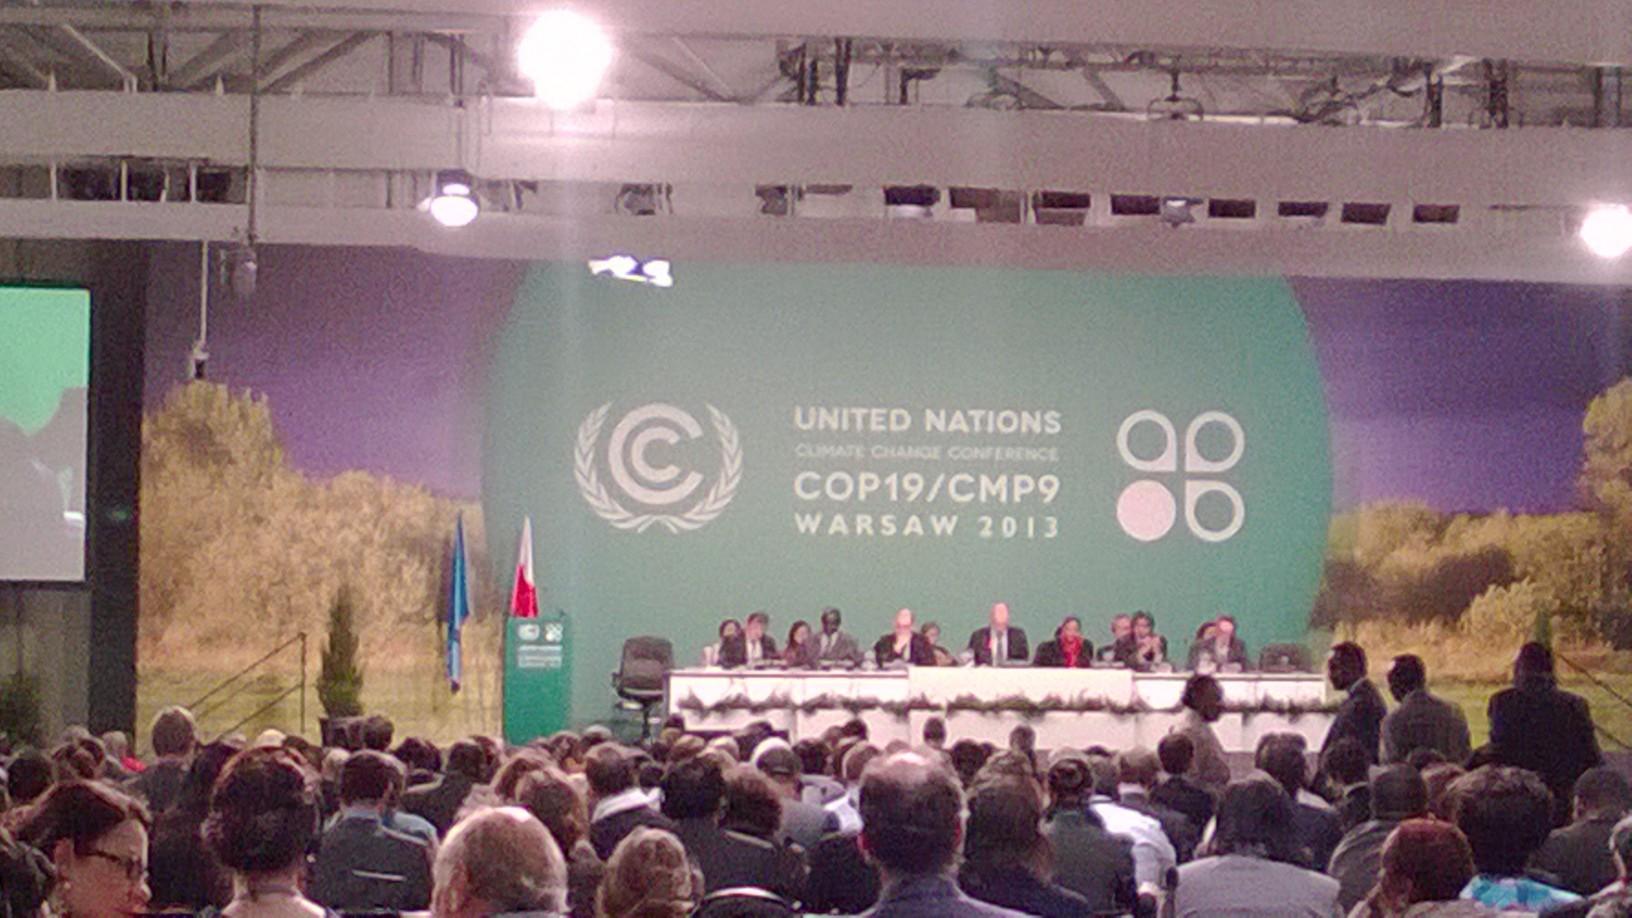 Klimatoppmøtet COP19 i Warszawa november 2013. Foto:Tiina Ruohonen.